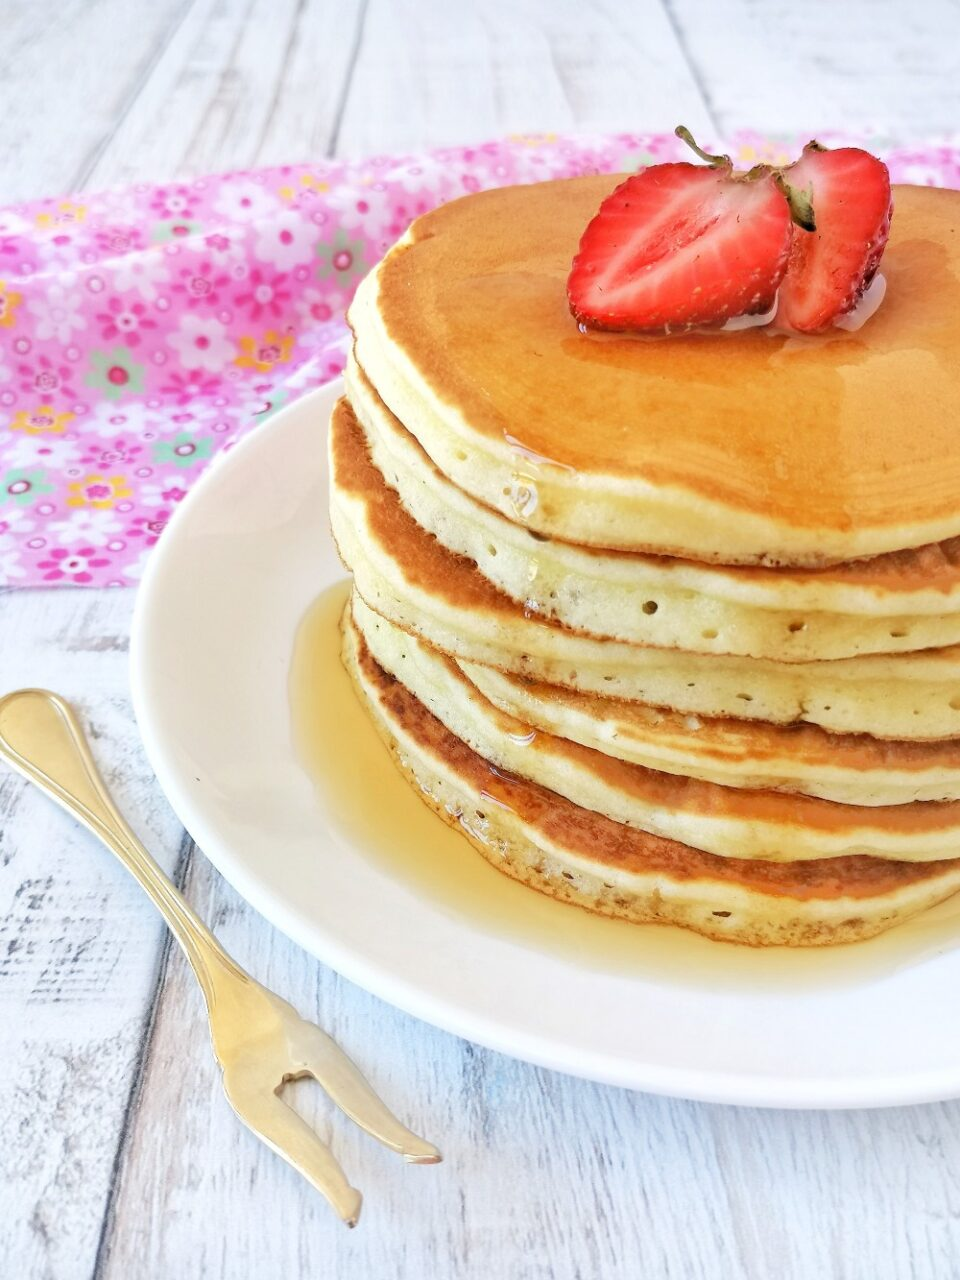 Pancake sofficissimi - Ricetta veloce